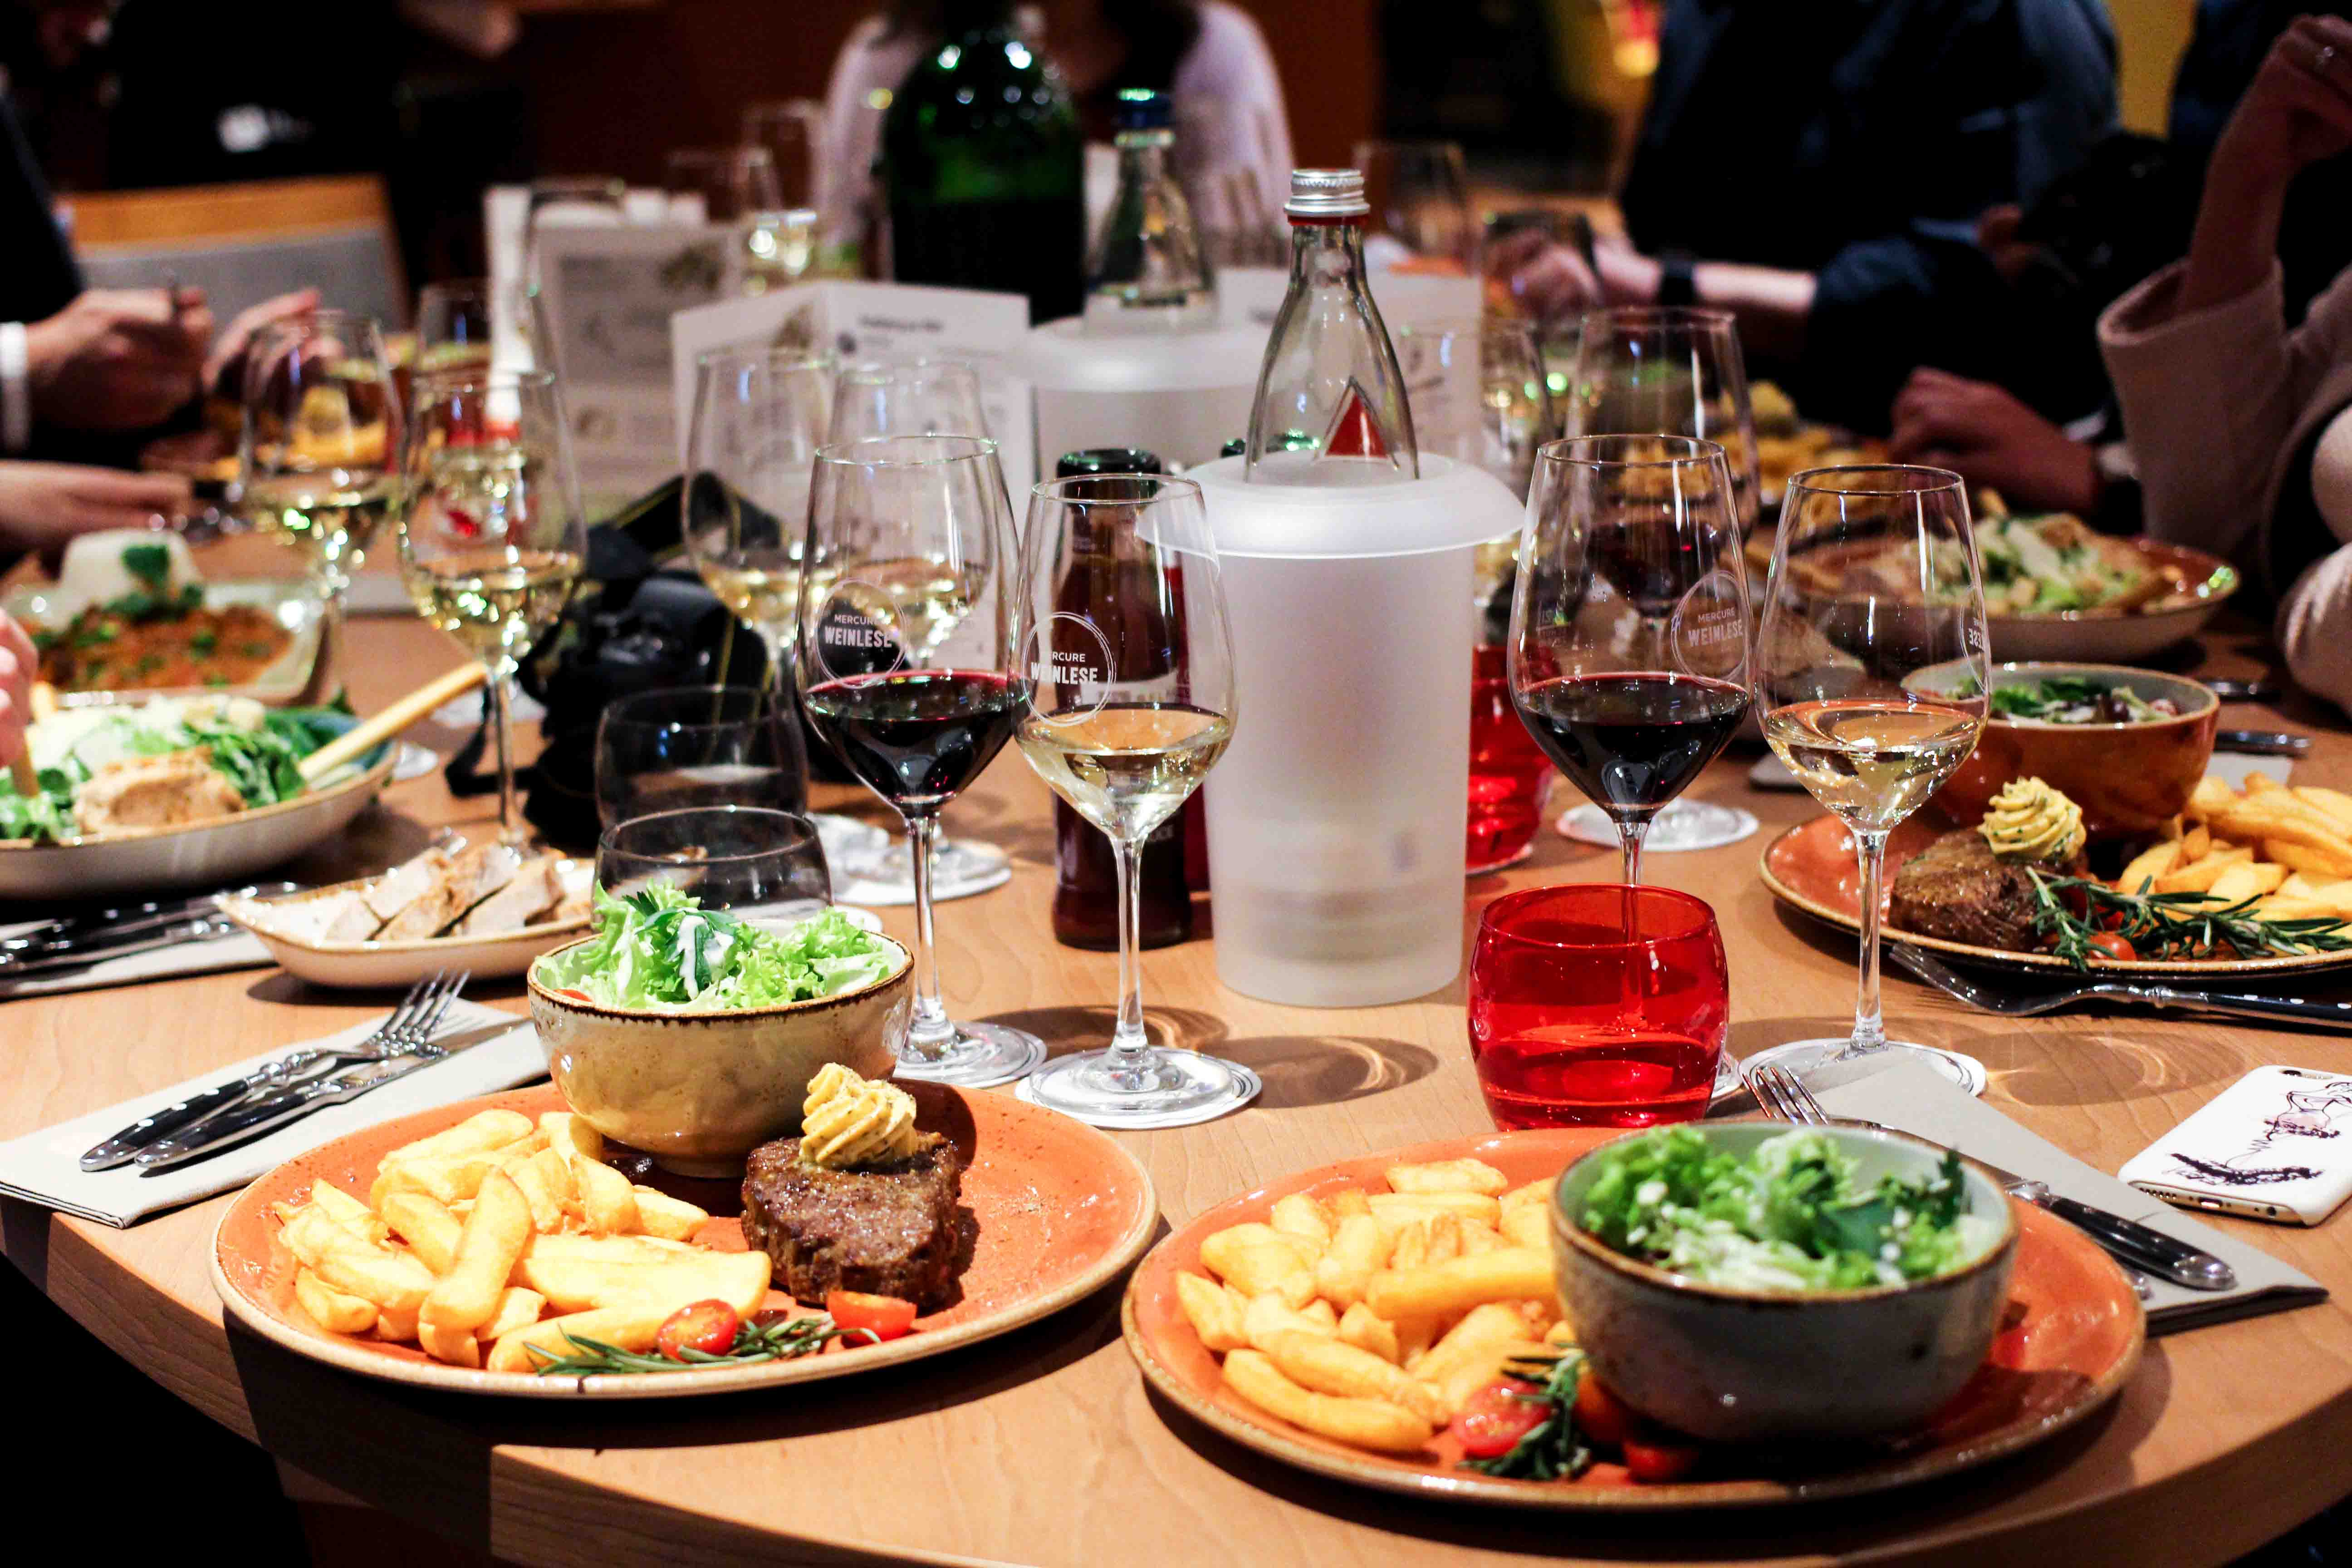 Mercure Weinlese Reiseblog Weinprobe Mercure Mannheim Bloggerevent Dinner